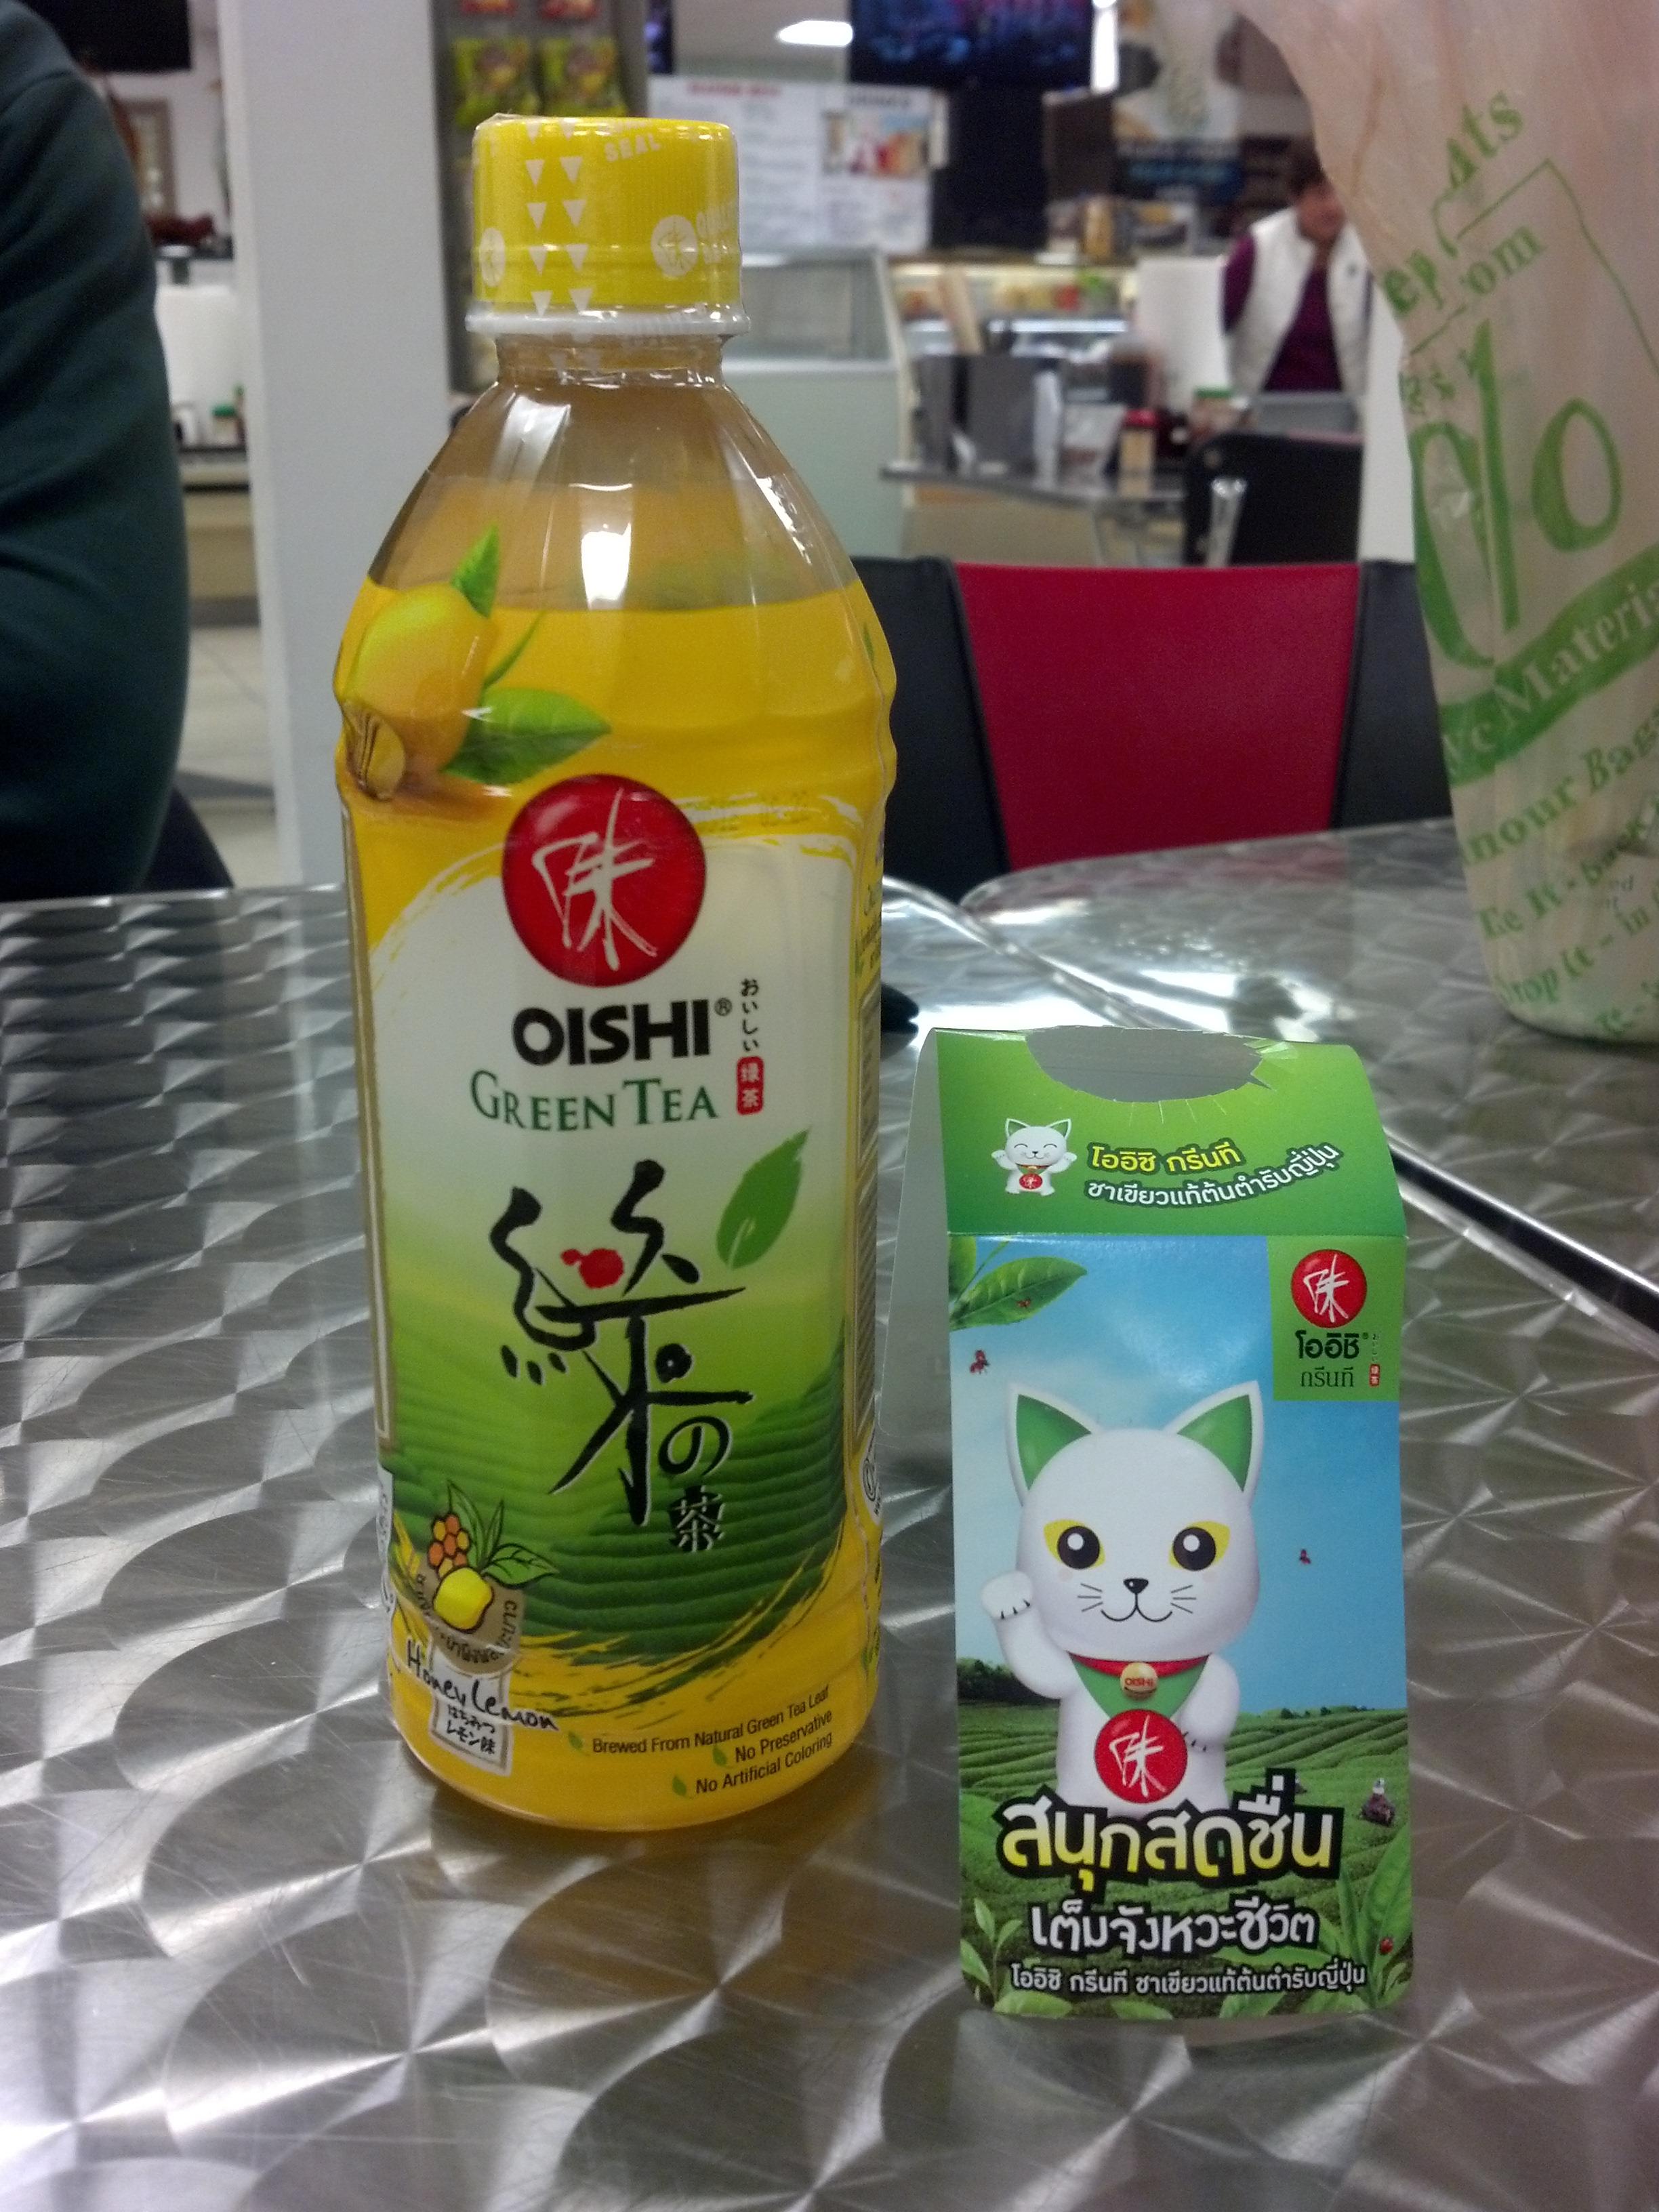 marketing objective of vita lemon tea